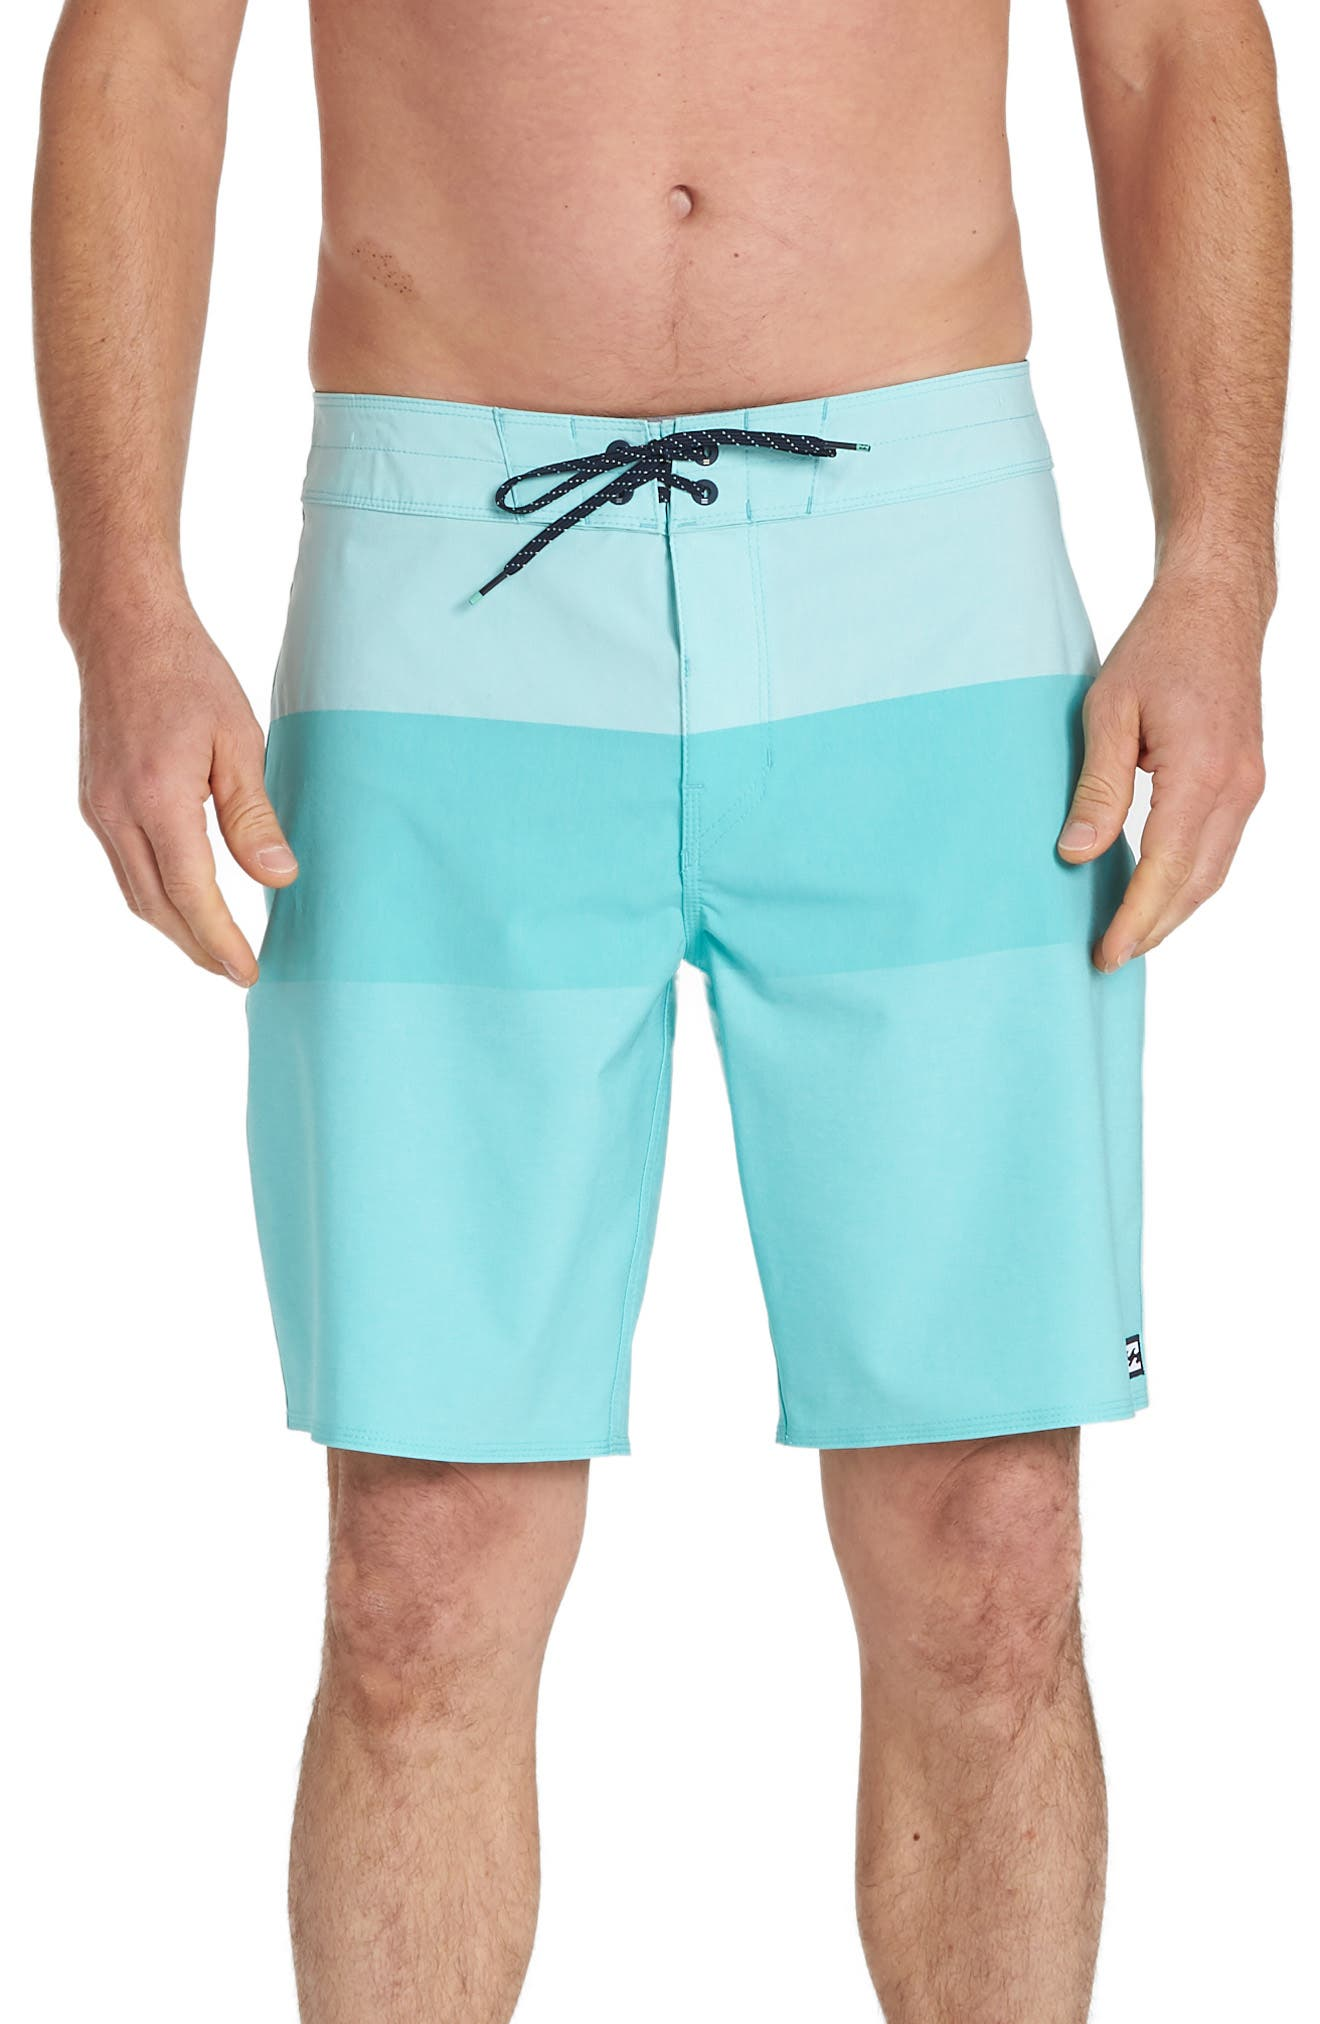 Billabong Airlite Board Shorts, Blue/green